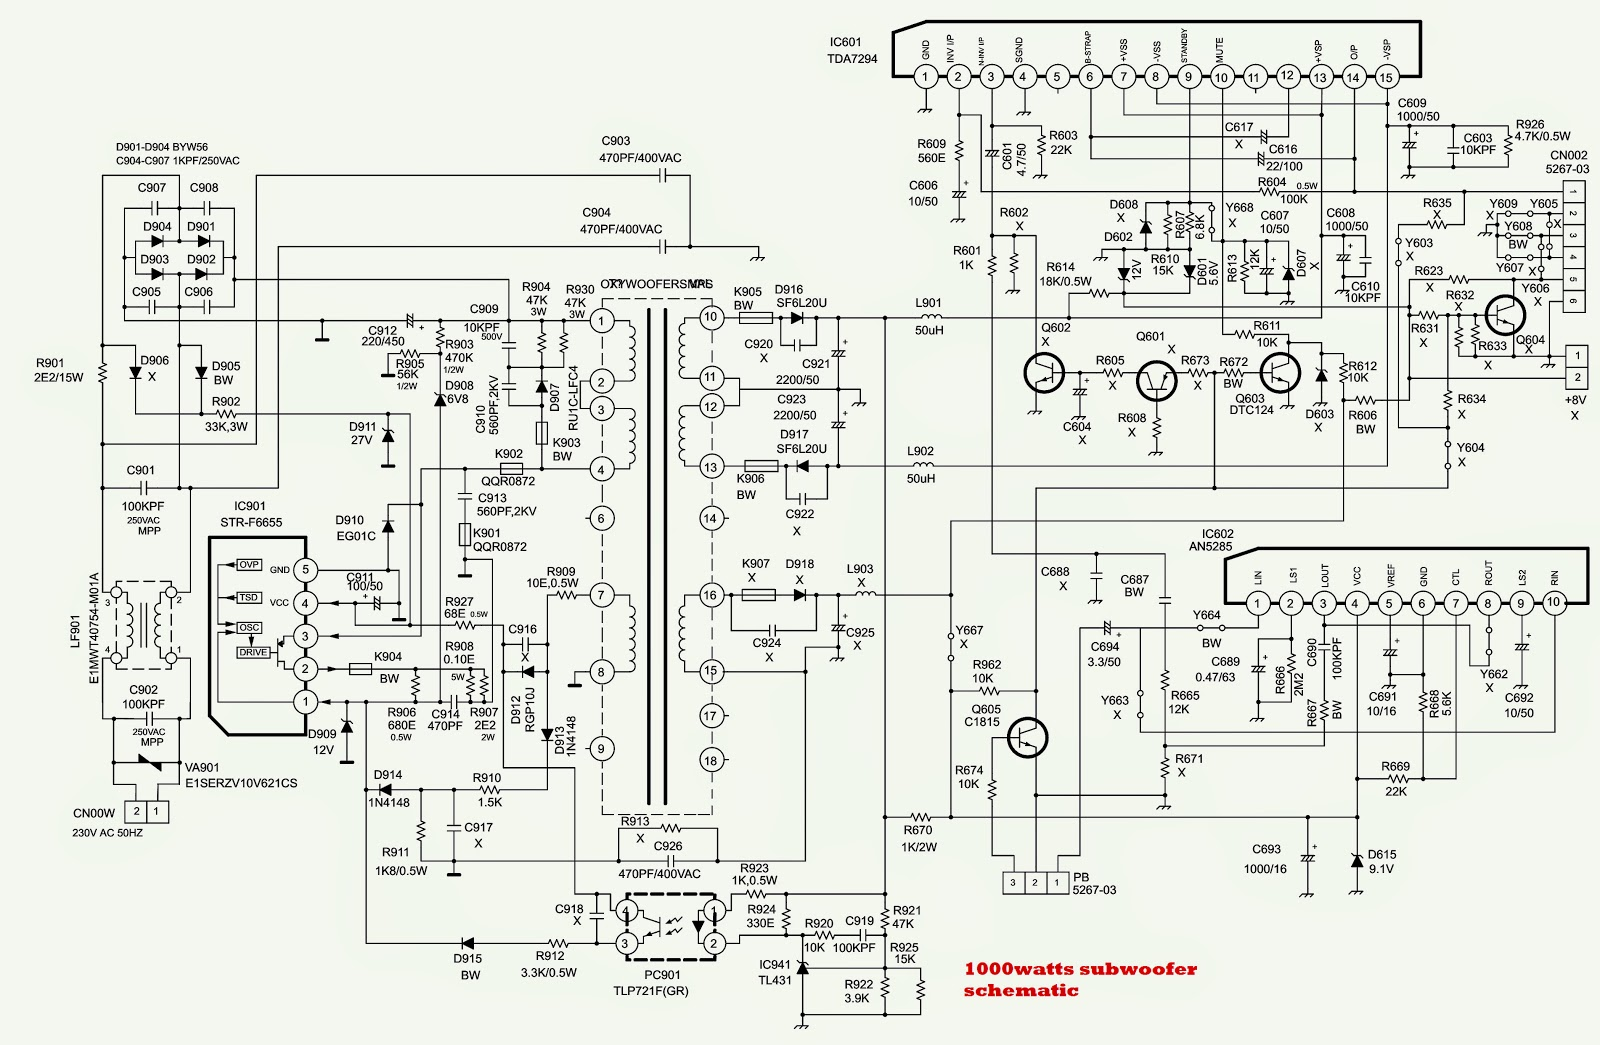 b w zeppelin circuit diagram wiring diagram datasource b w zeppelin circuit diagram [ 1600 x 1045 Pixel ]